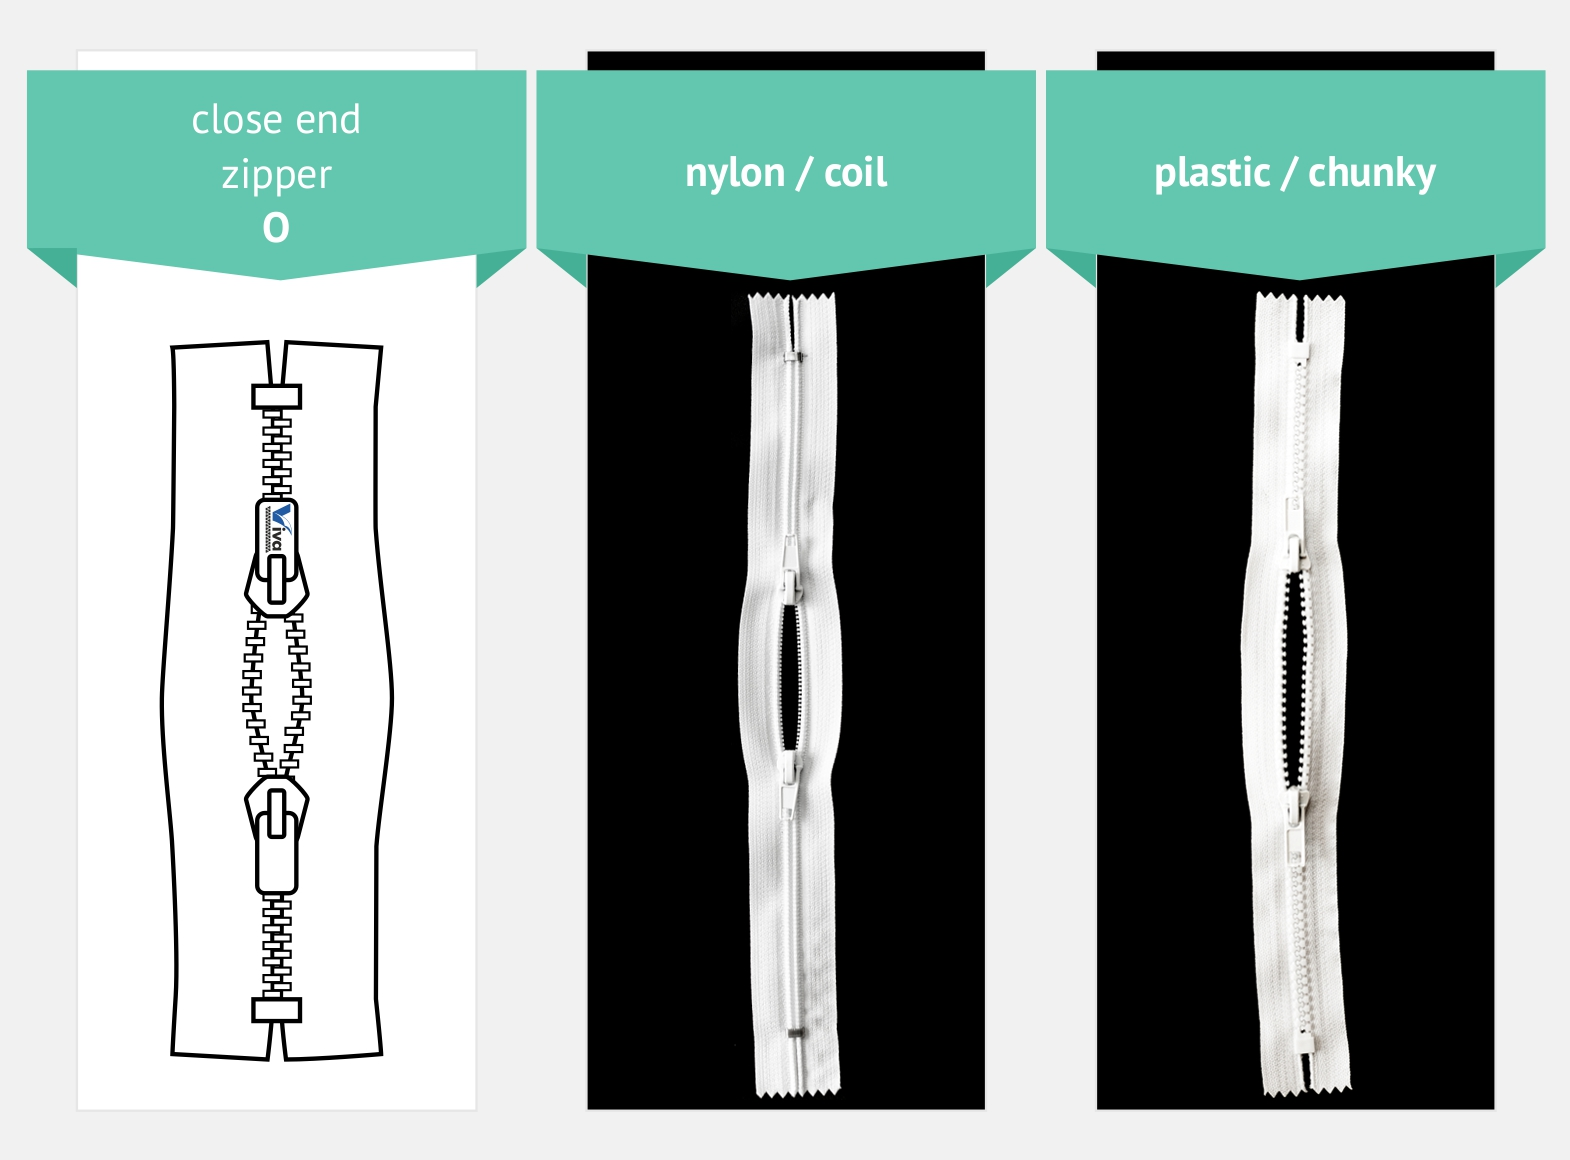 Zipper types close end O